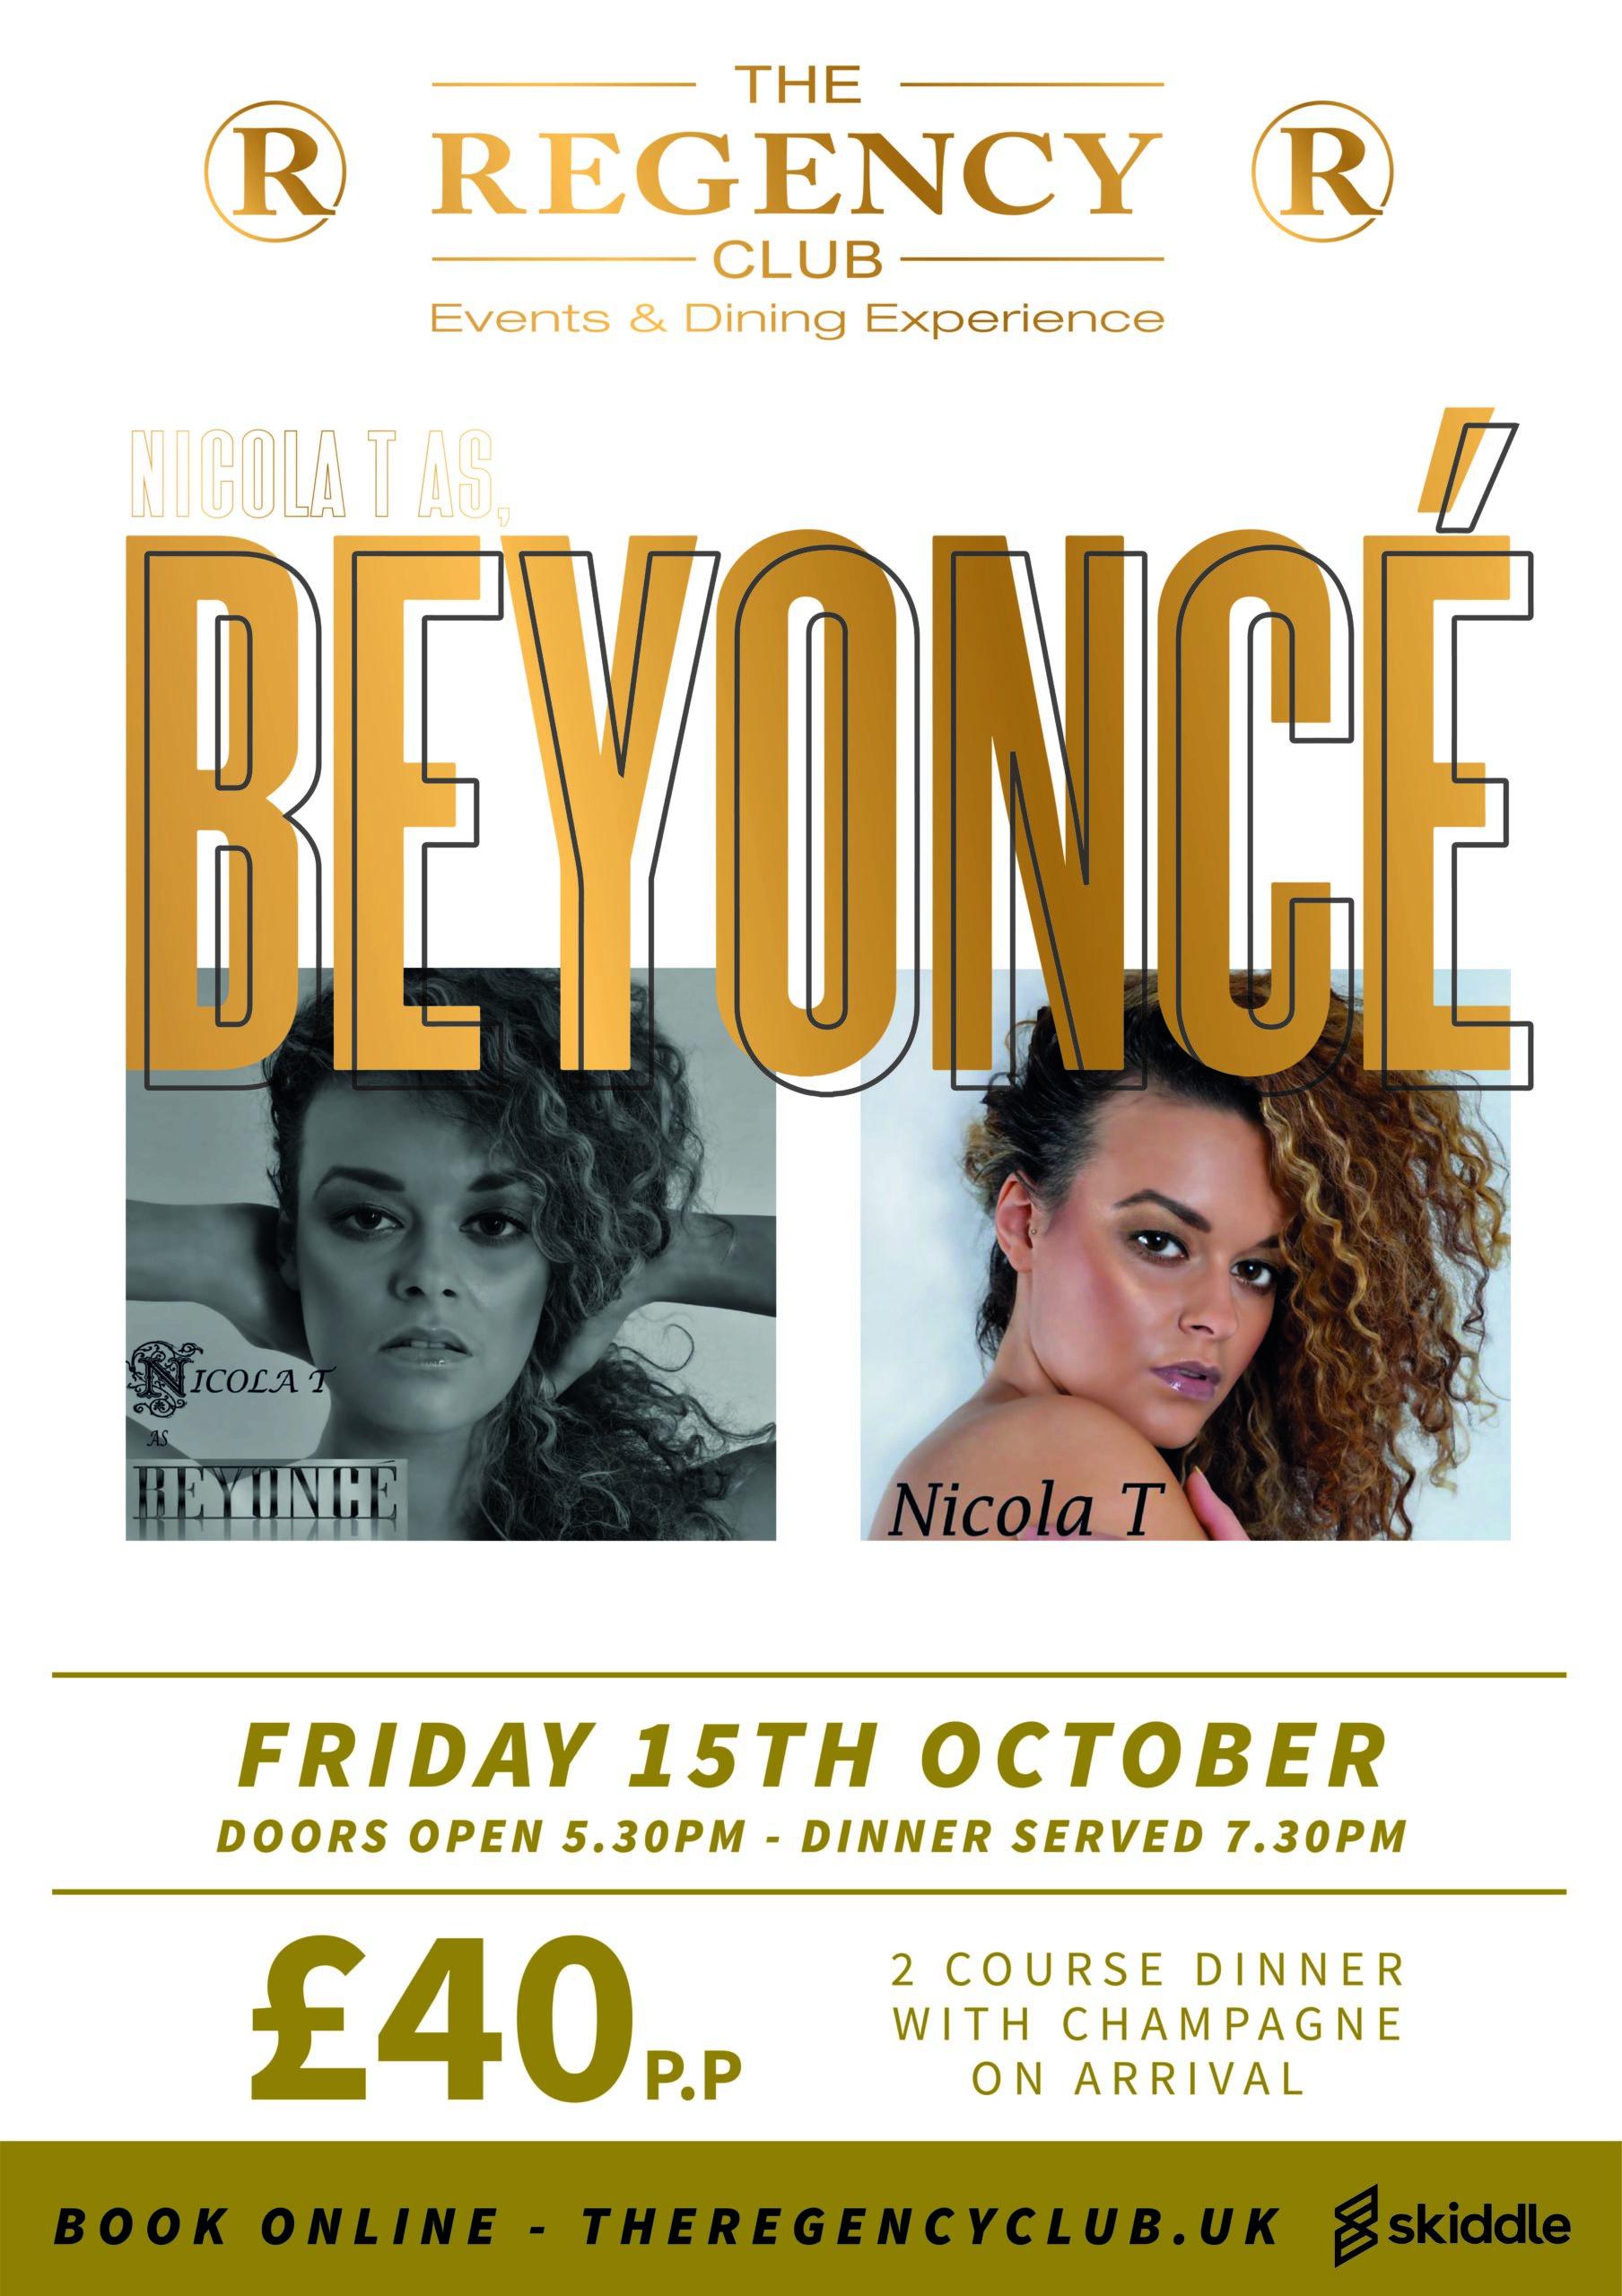 Nicola T as Beyonce – Fri 15 Oct